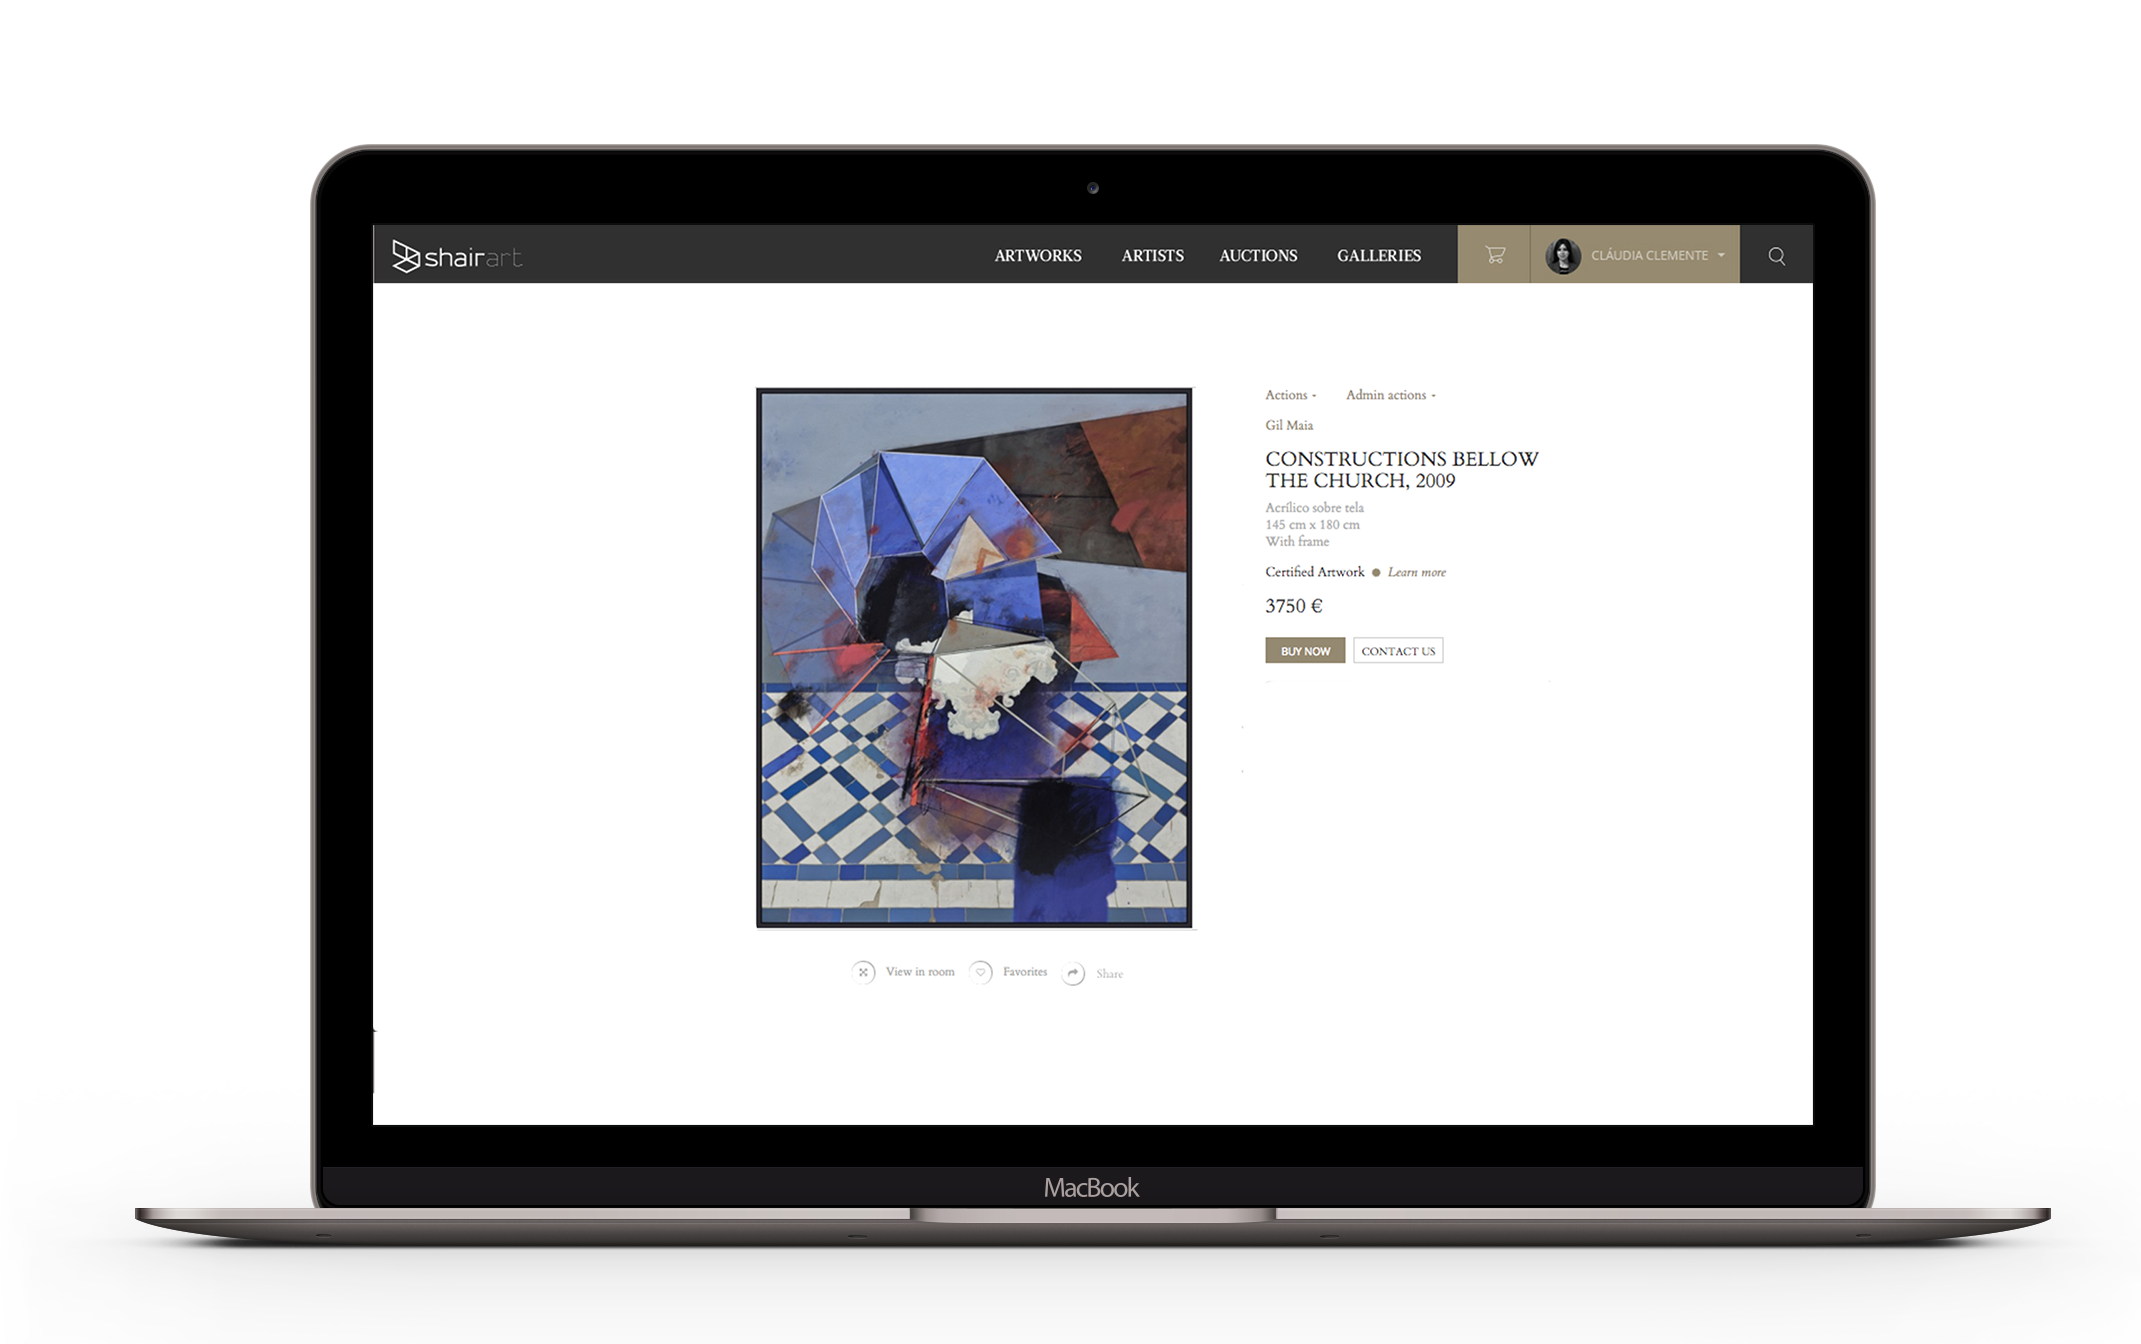 artist profile on macbook 3